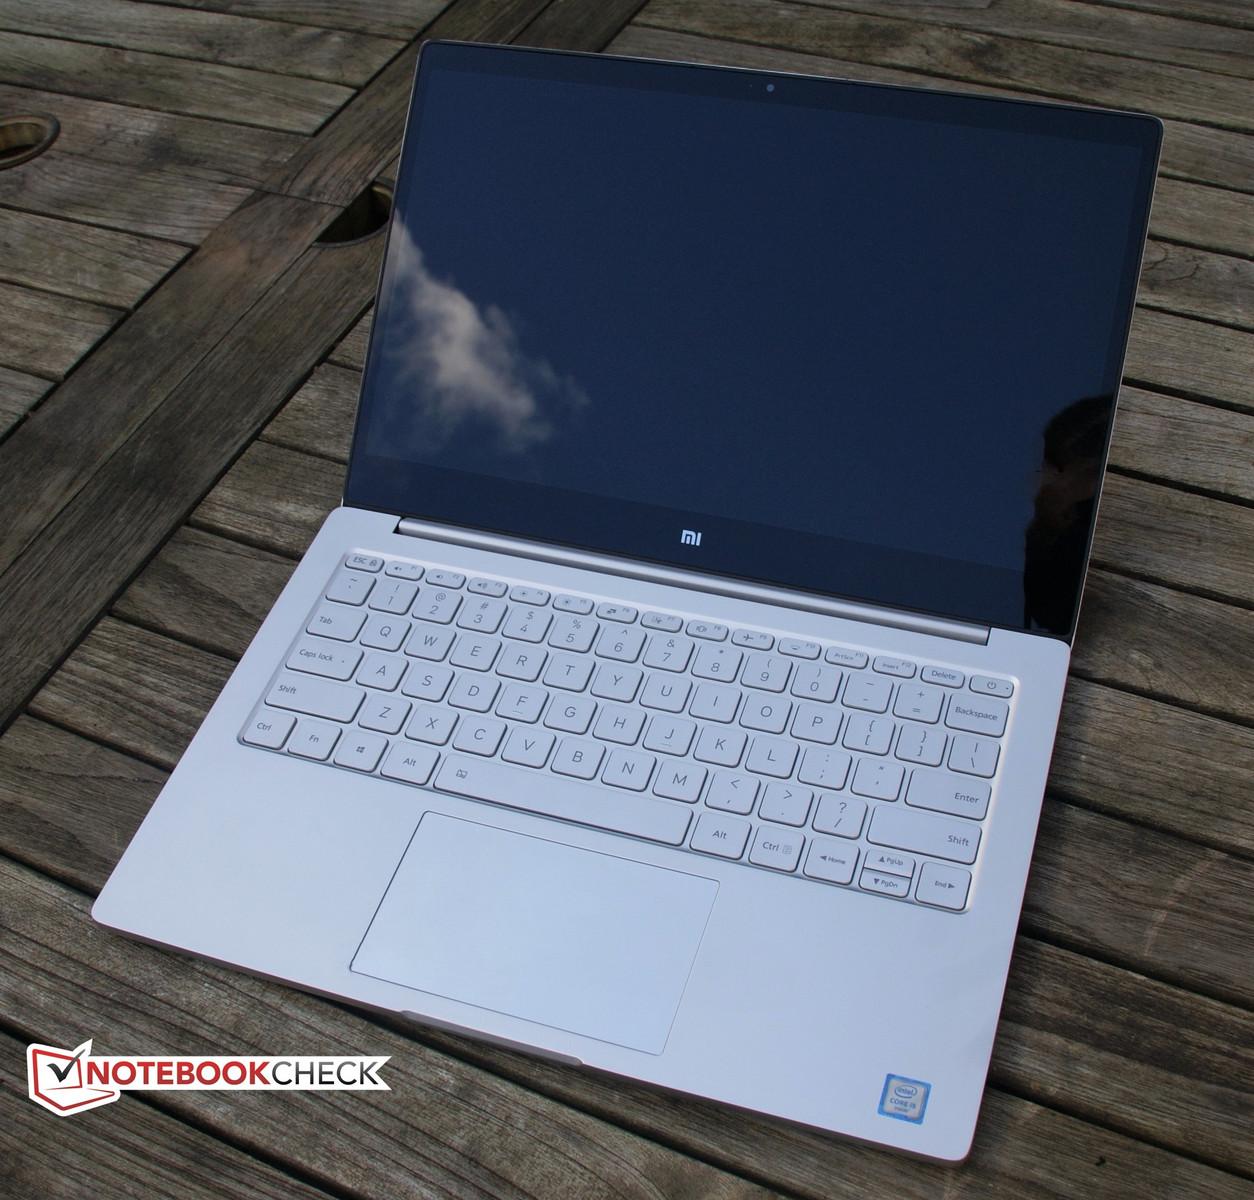 Xiaomi Mi Air 13 3 Inch Notebook Review Notebookcheck